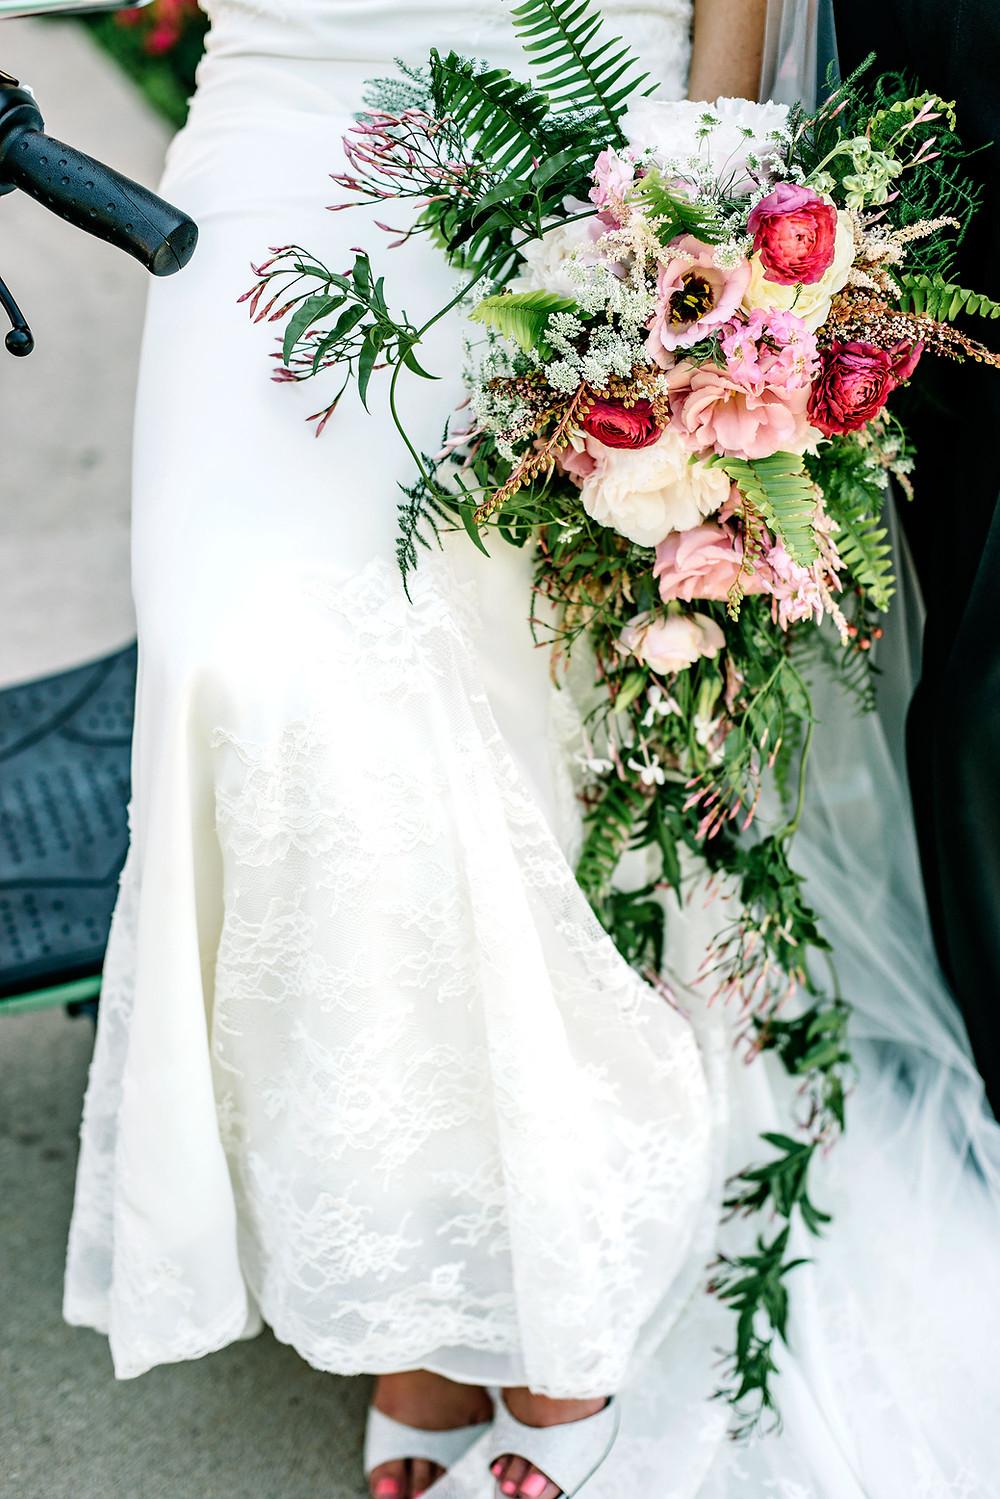 Wedding Florist at the Denver Botanic Gardens